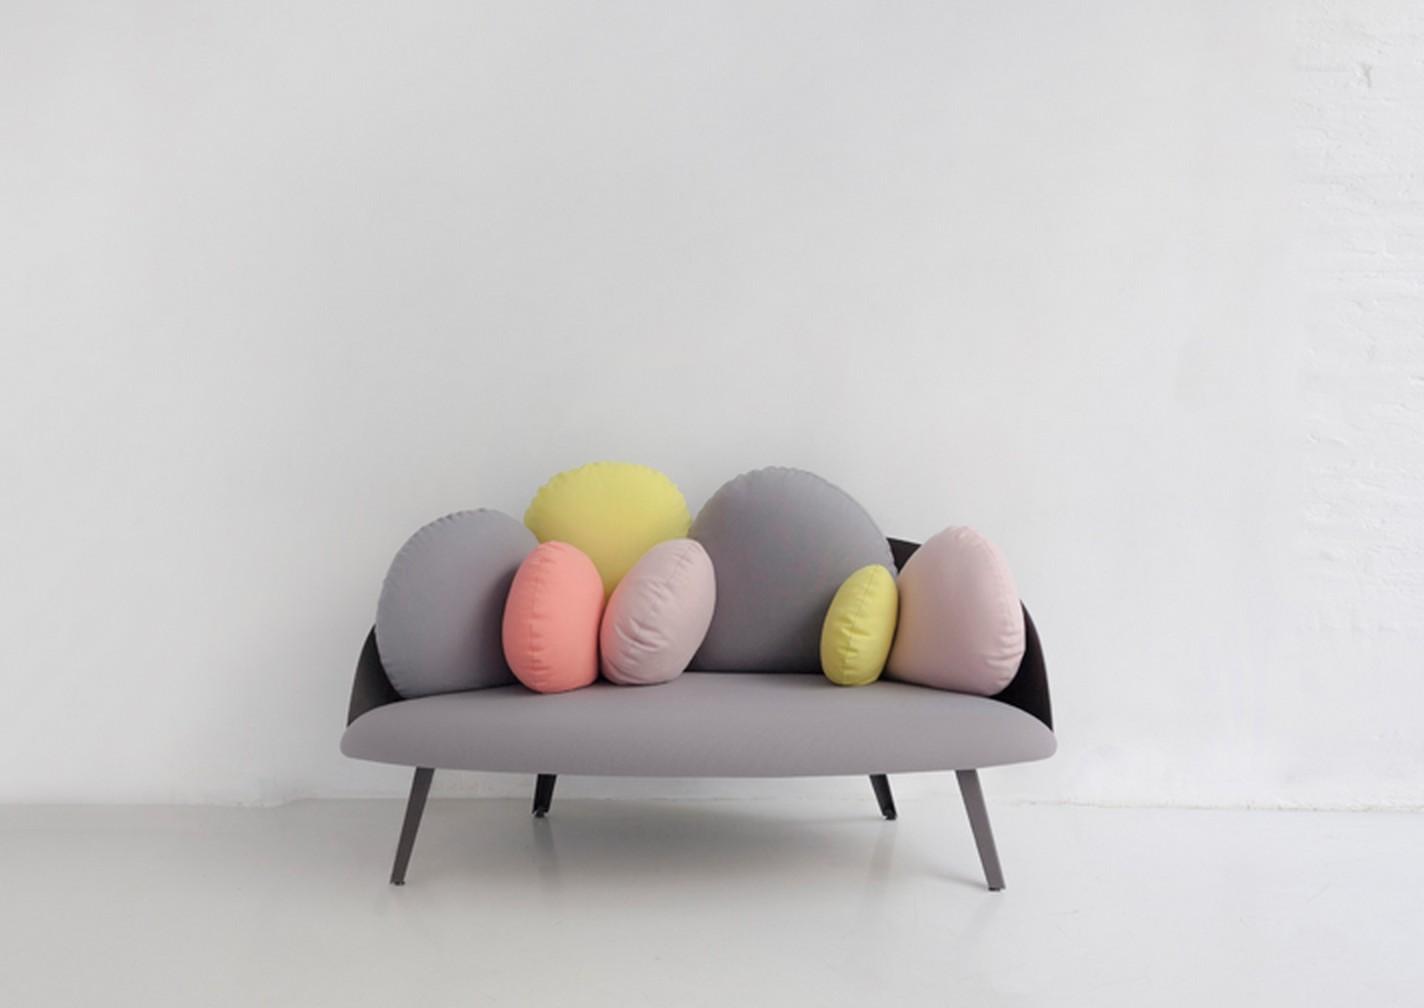 canap nubilo par constance guisset blog d co design. Black Bedroom Furniture Sets. Home Design Ideas